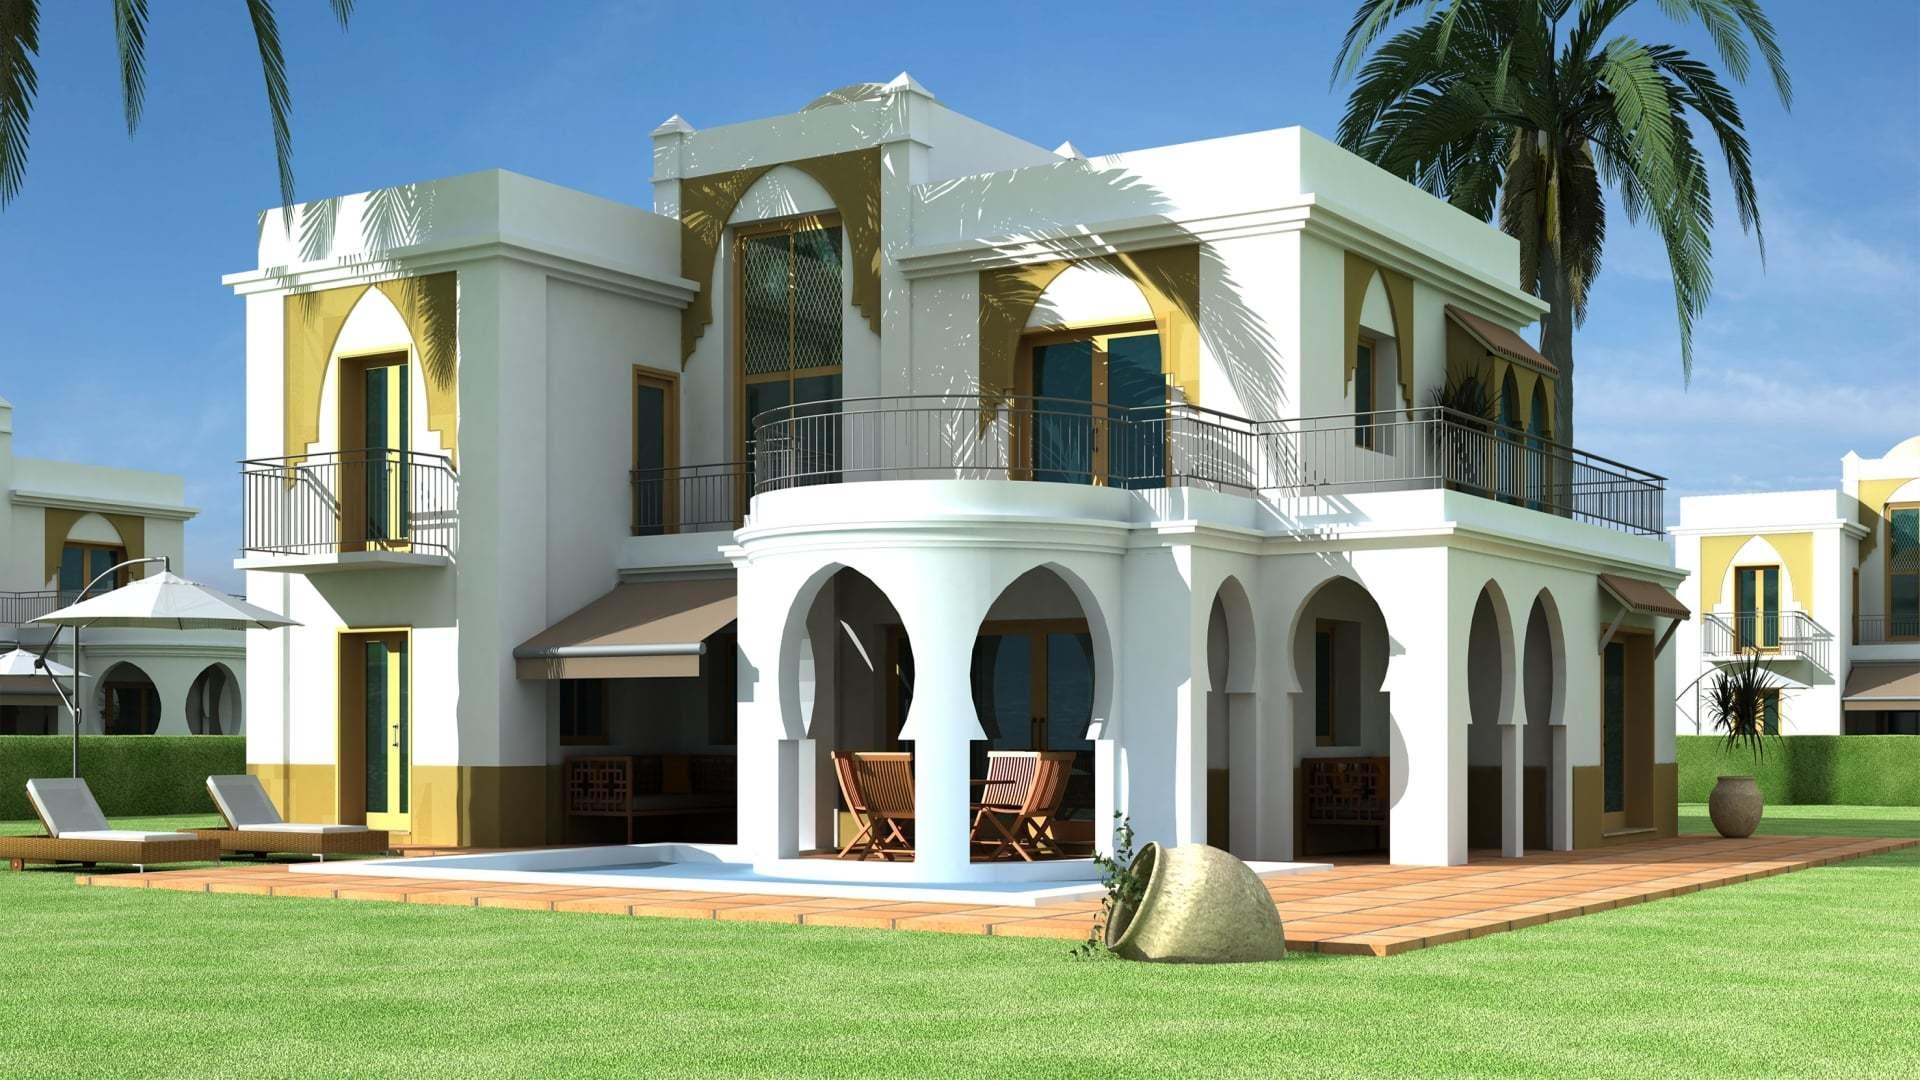 Sarı Yaldızlı Villa